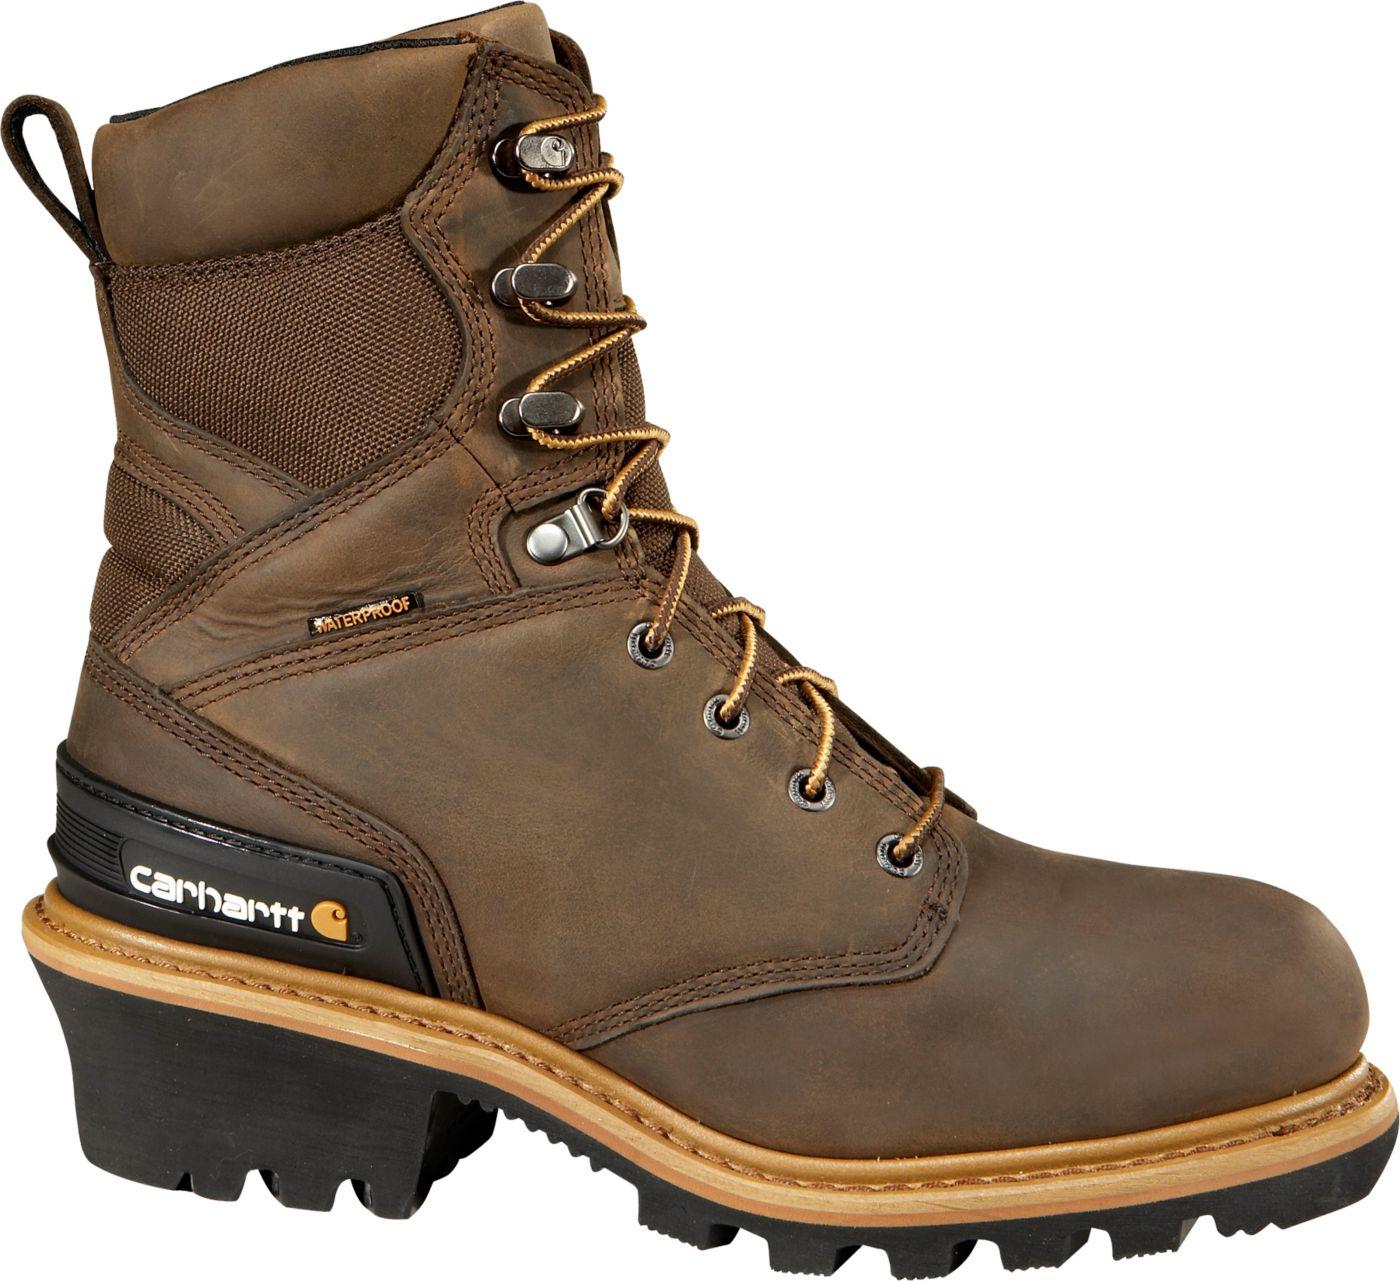 Carhartt Men's Logger 8'' Waterproof 400g Composite Toe Work Boots